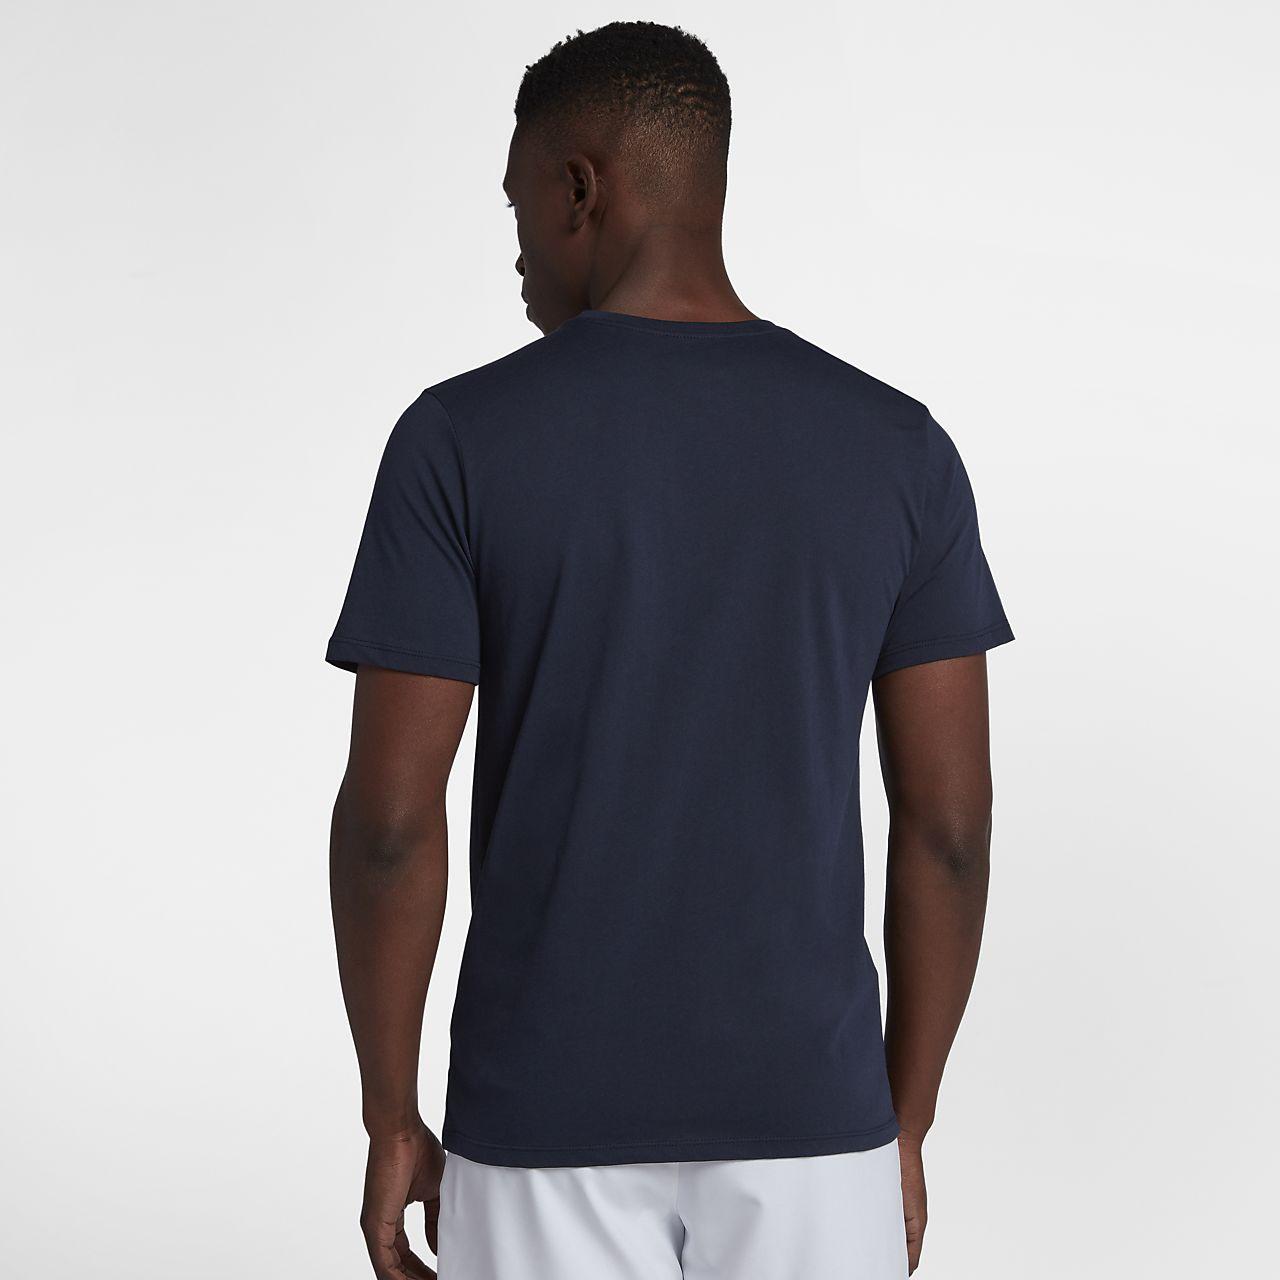 huge selection of aad72 8ad89 ... Tennis-t-shirt NikeCourt för män